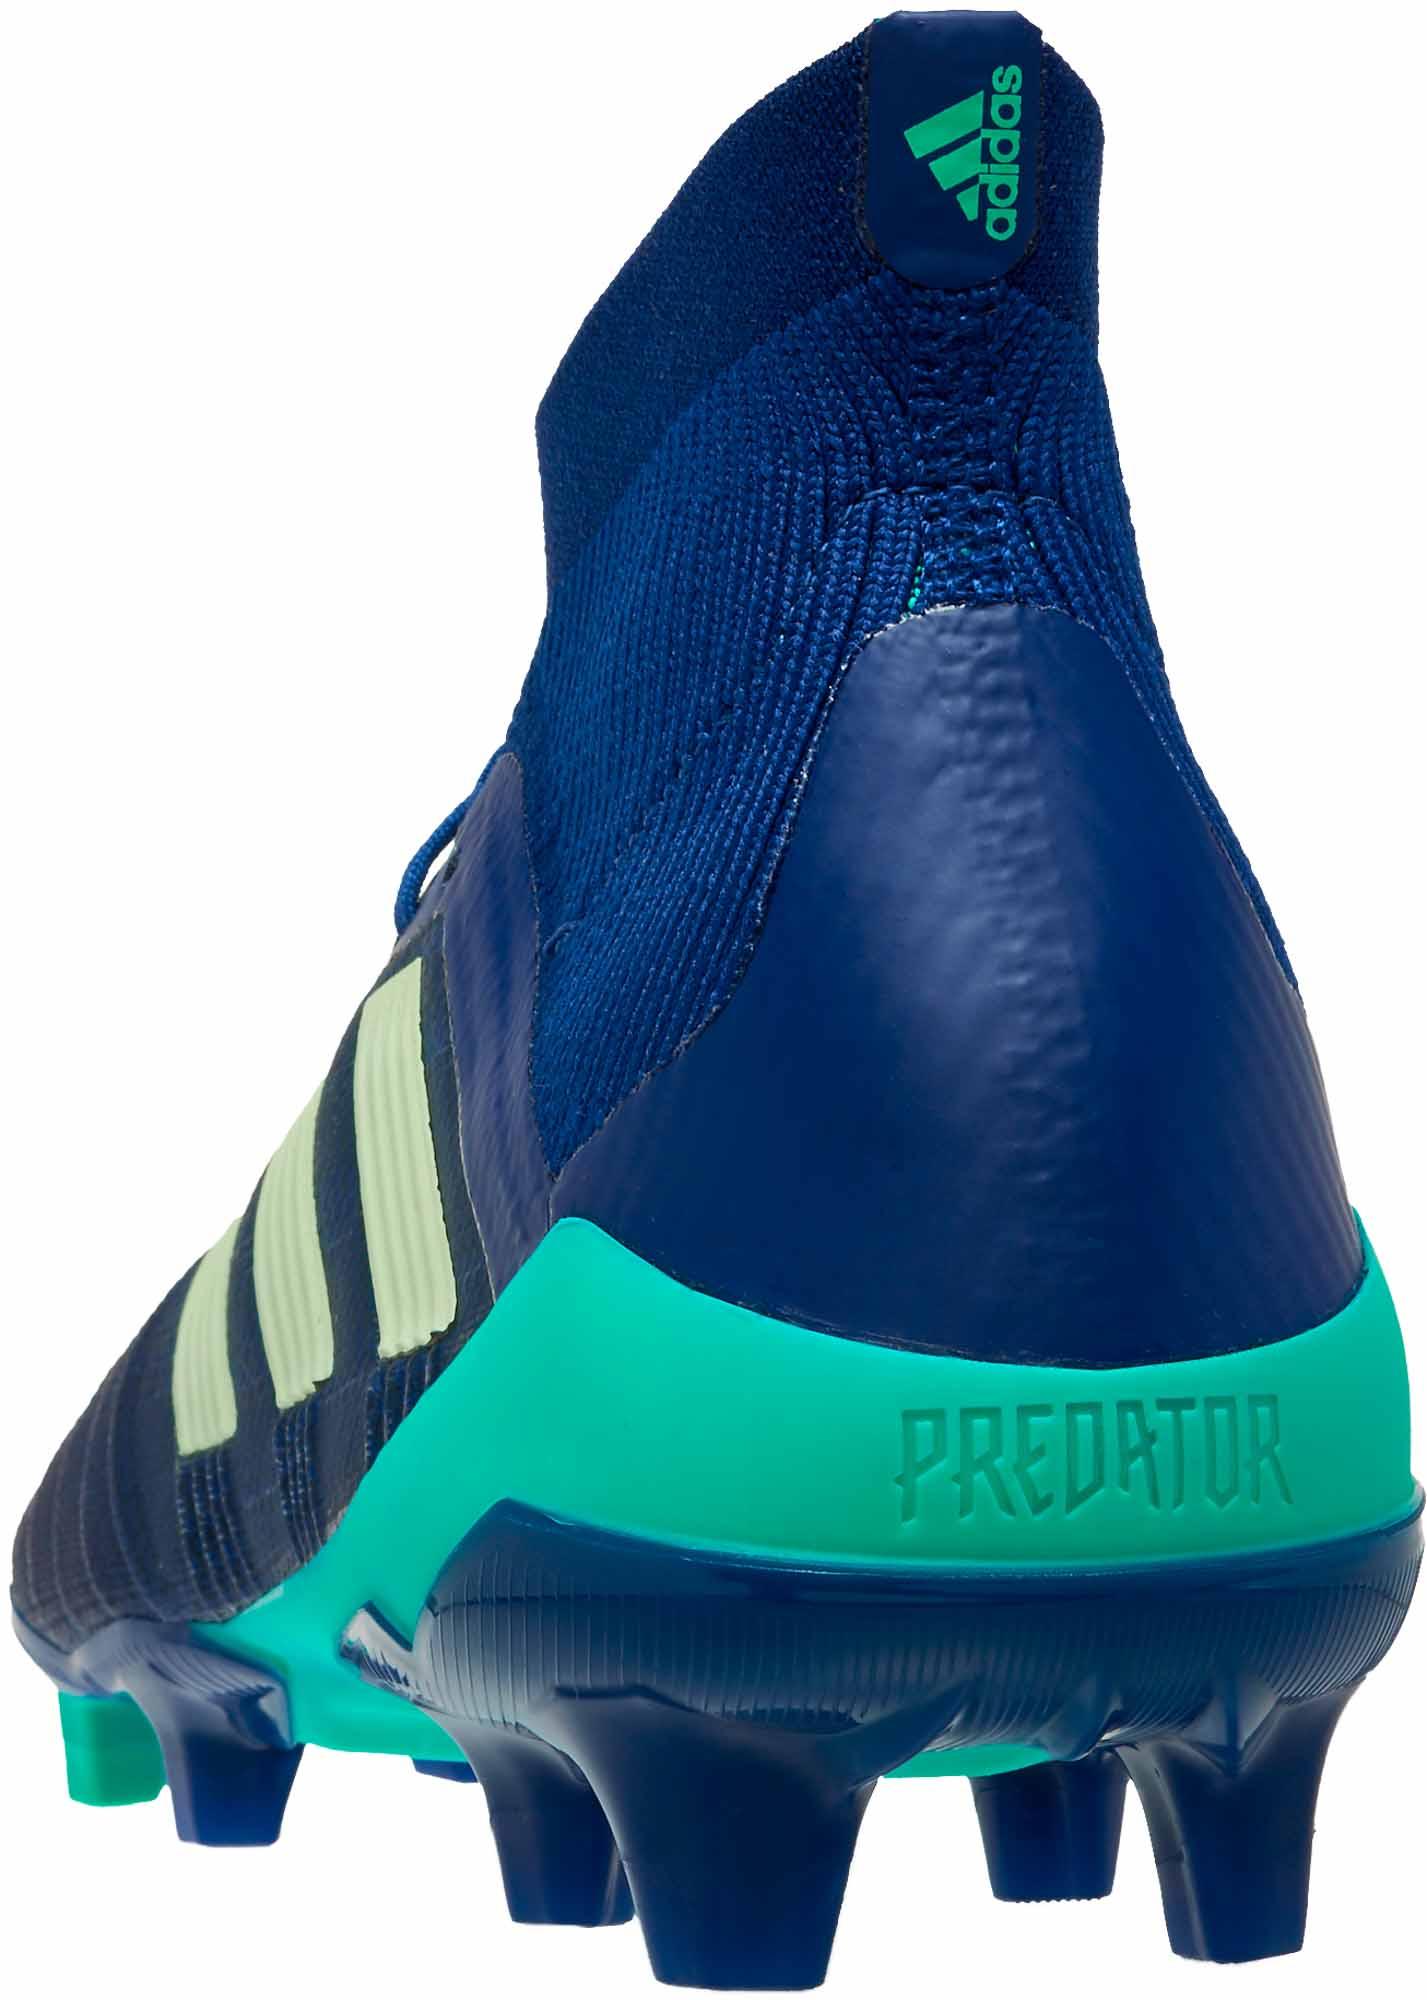 Adidas Predator 18.1 11.5 eUOu0